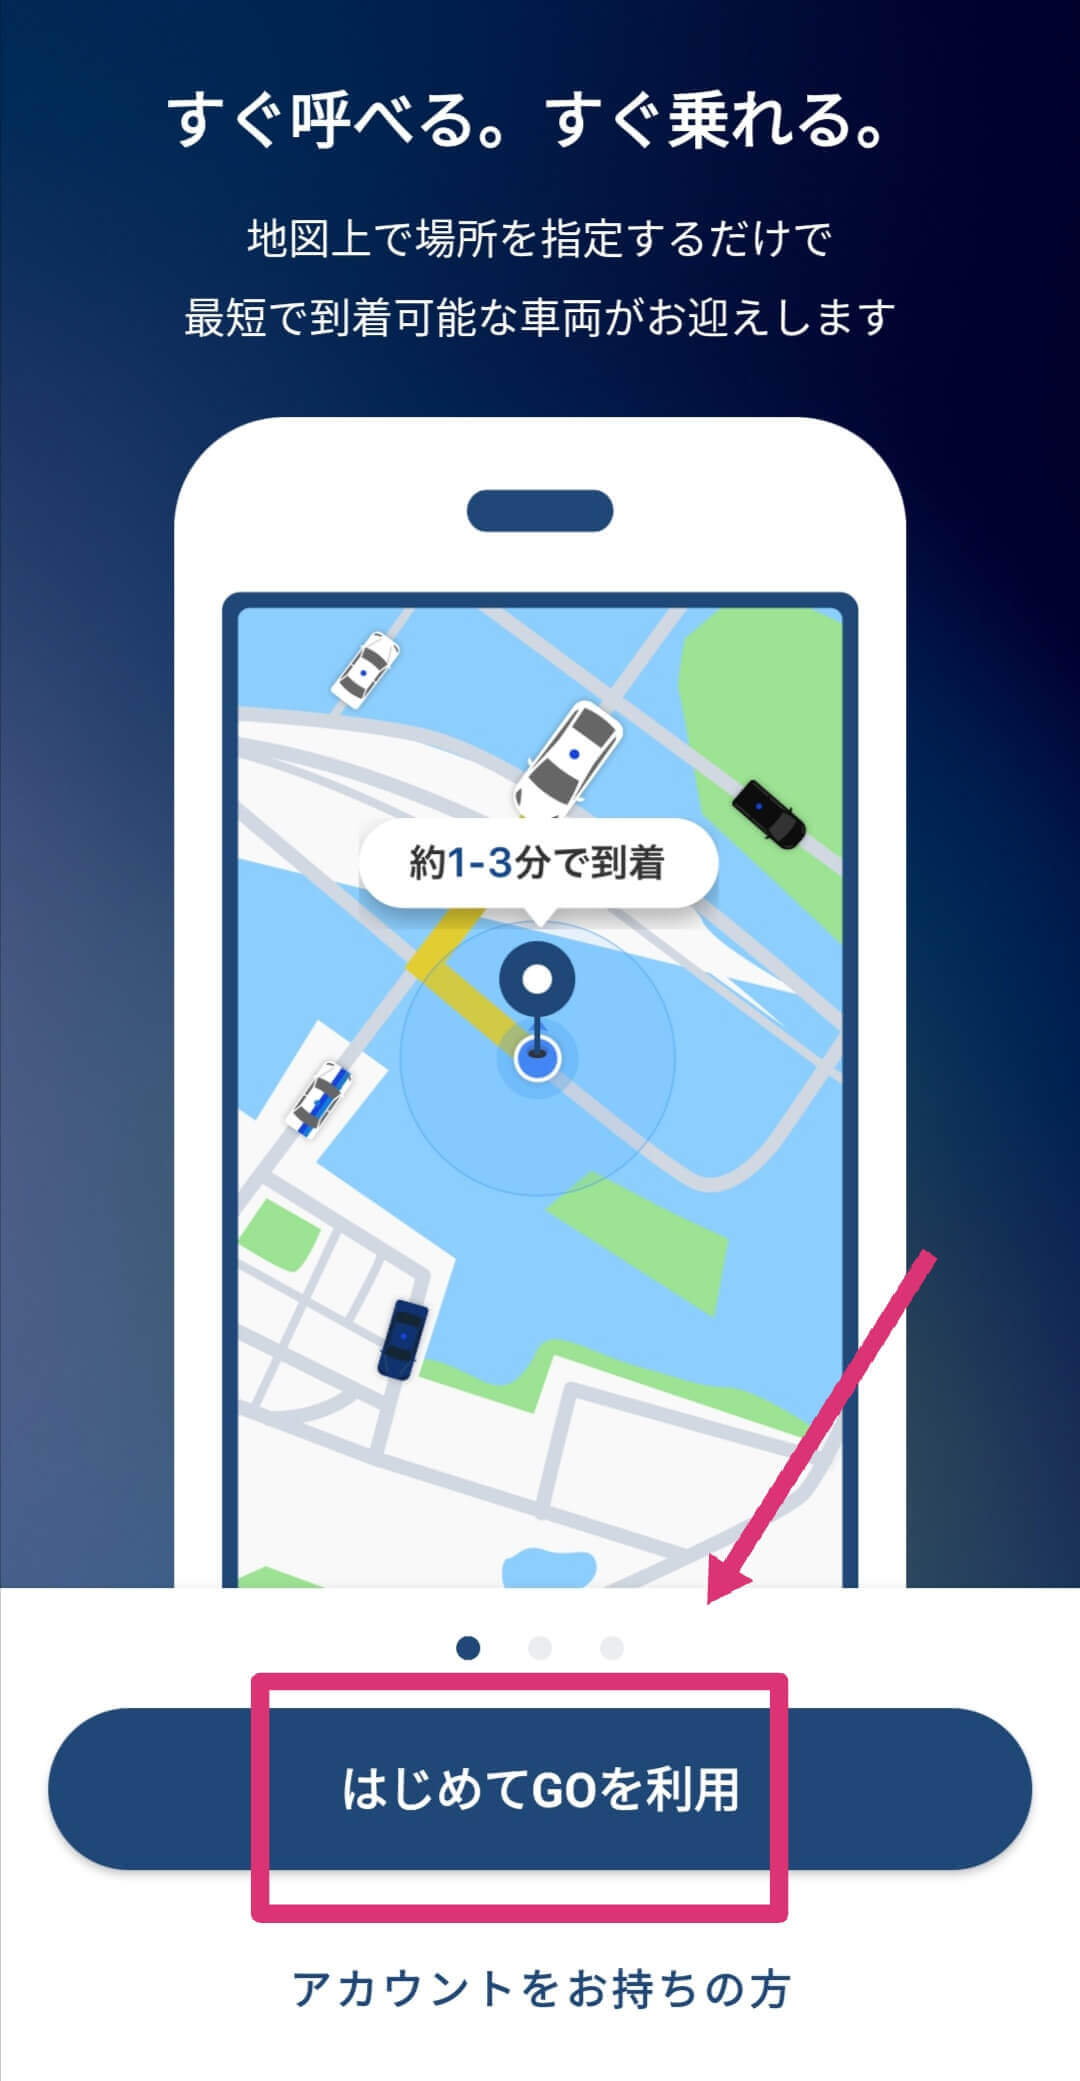 GOタクシーアプリのクーポンコード使い方・適用方法3